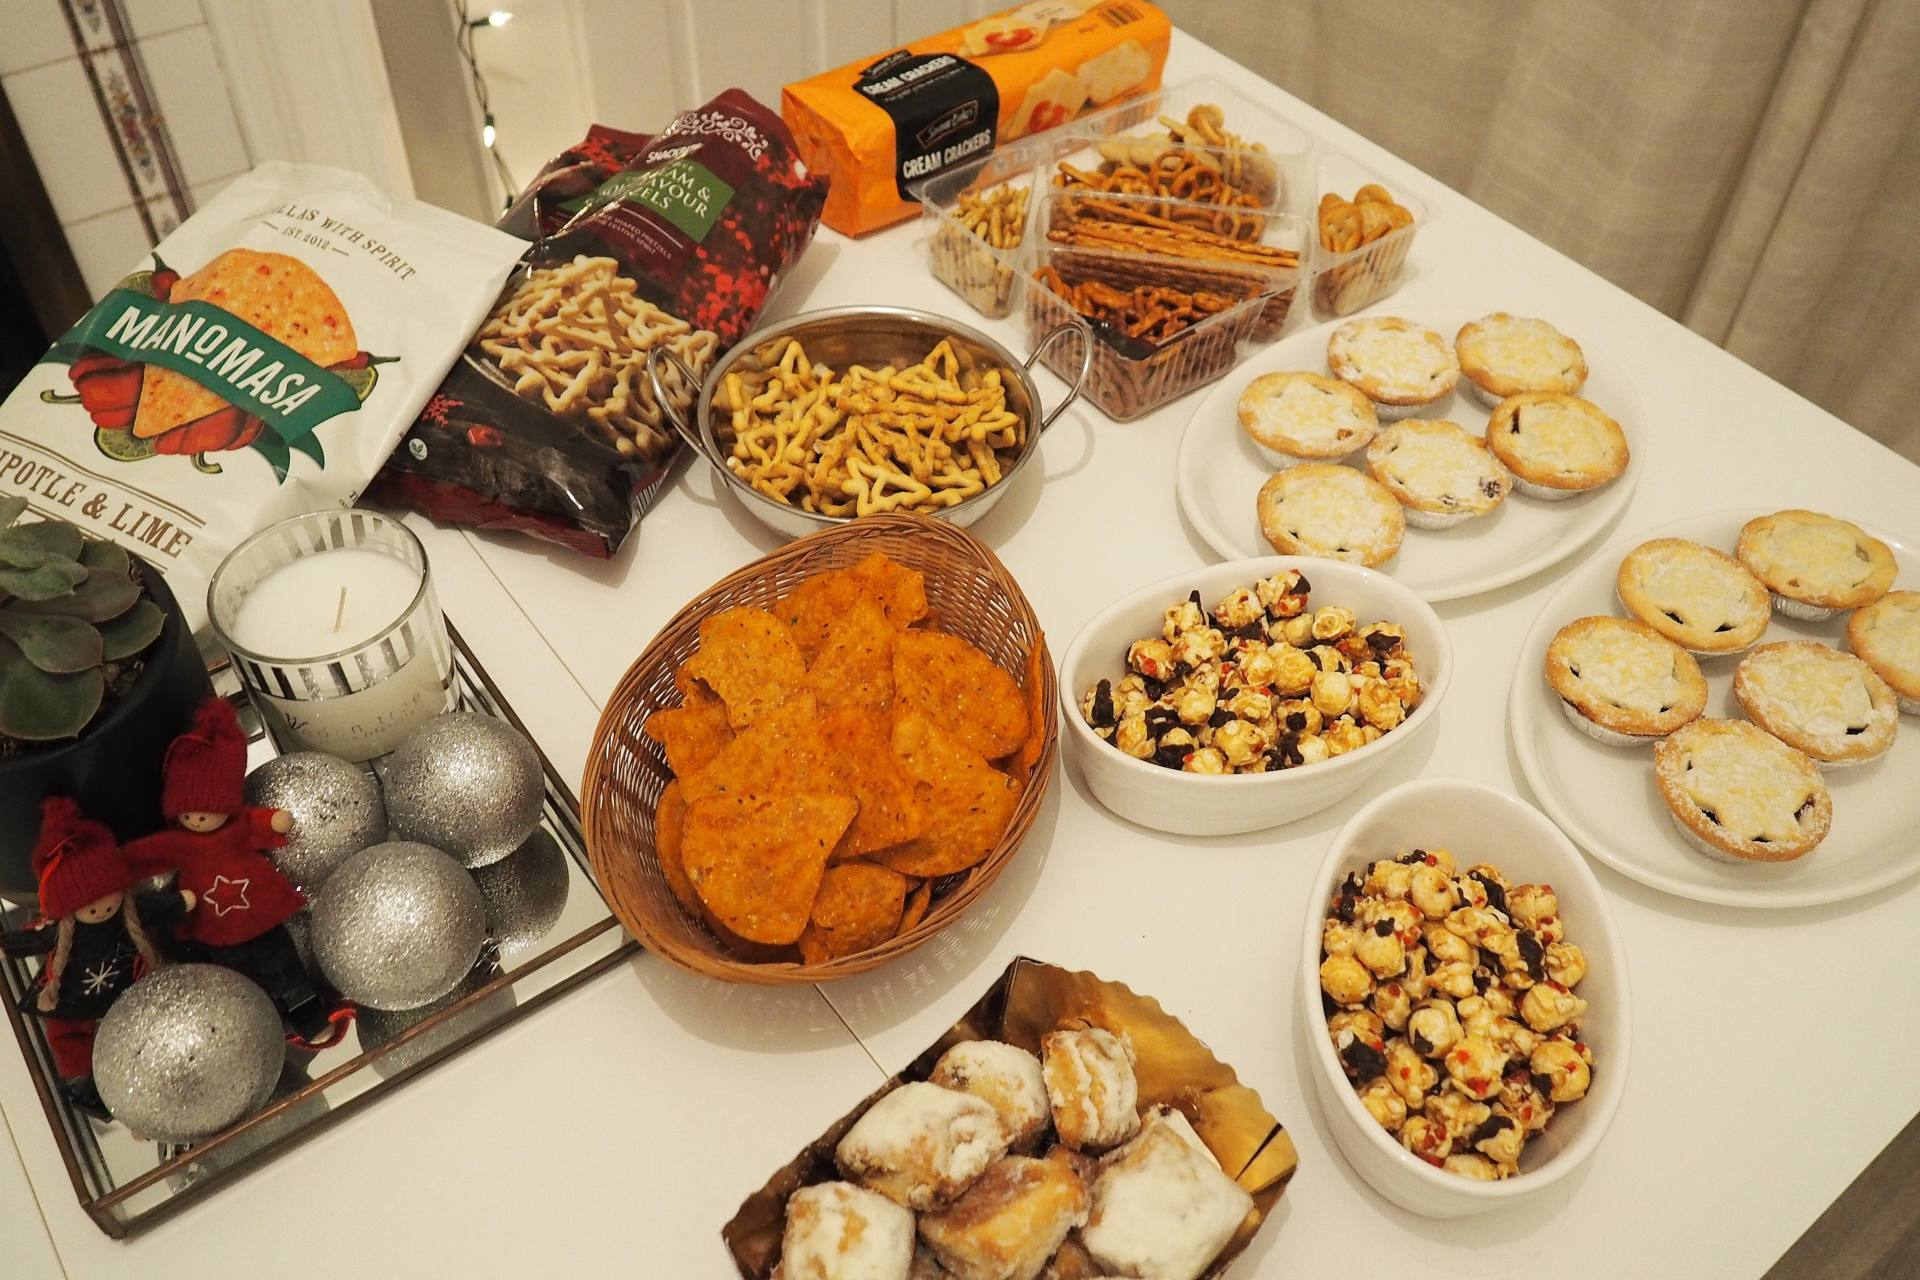 Aldi-Blogger-Collab-Feast-Table-Snacks-Crackers - Emma Victoria Stokes